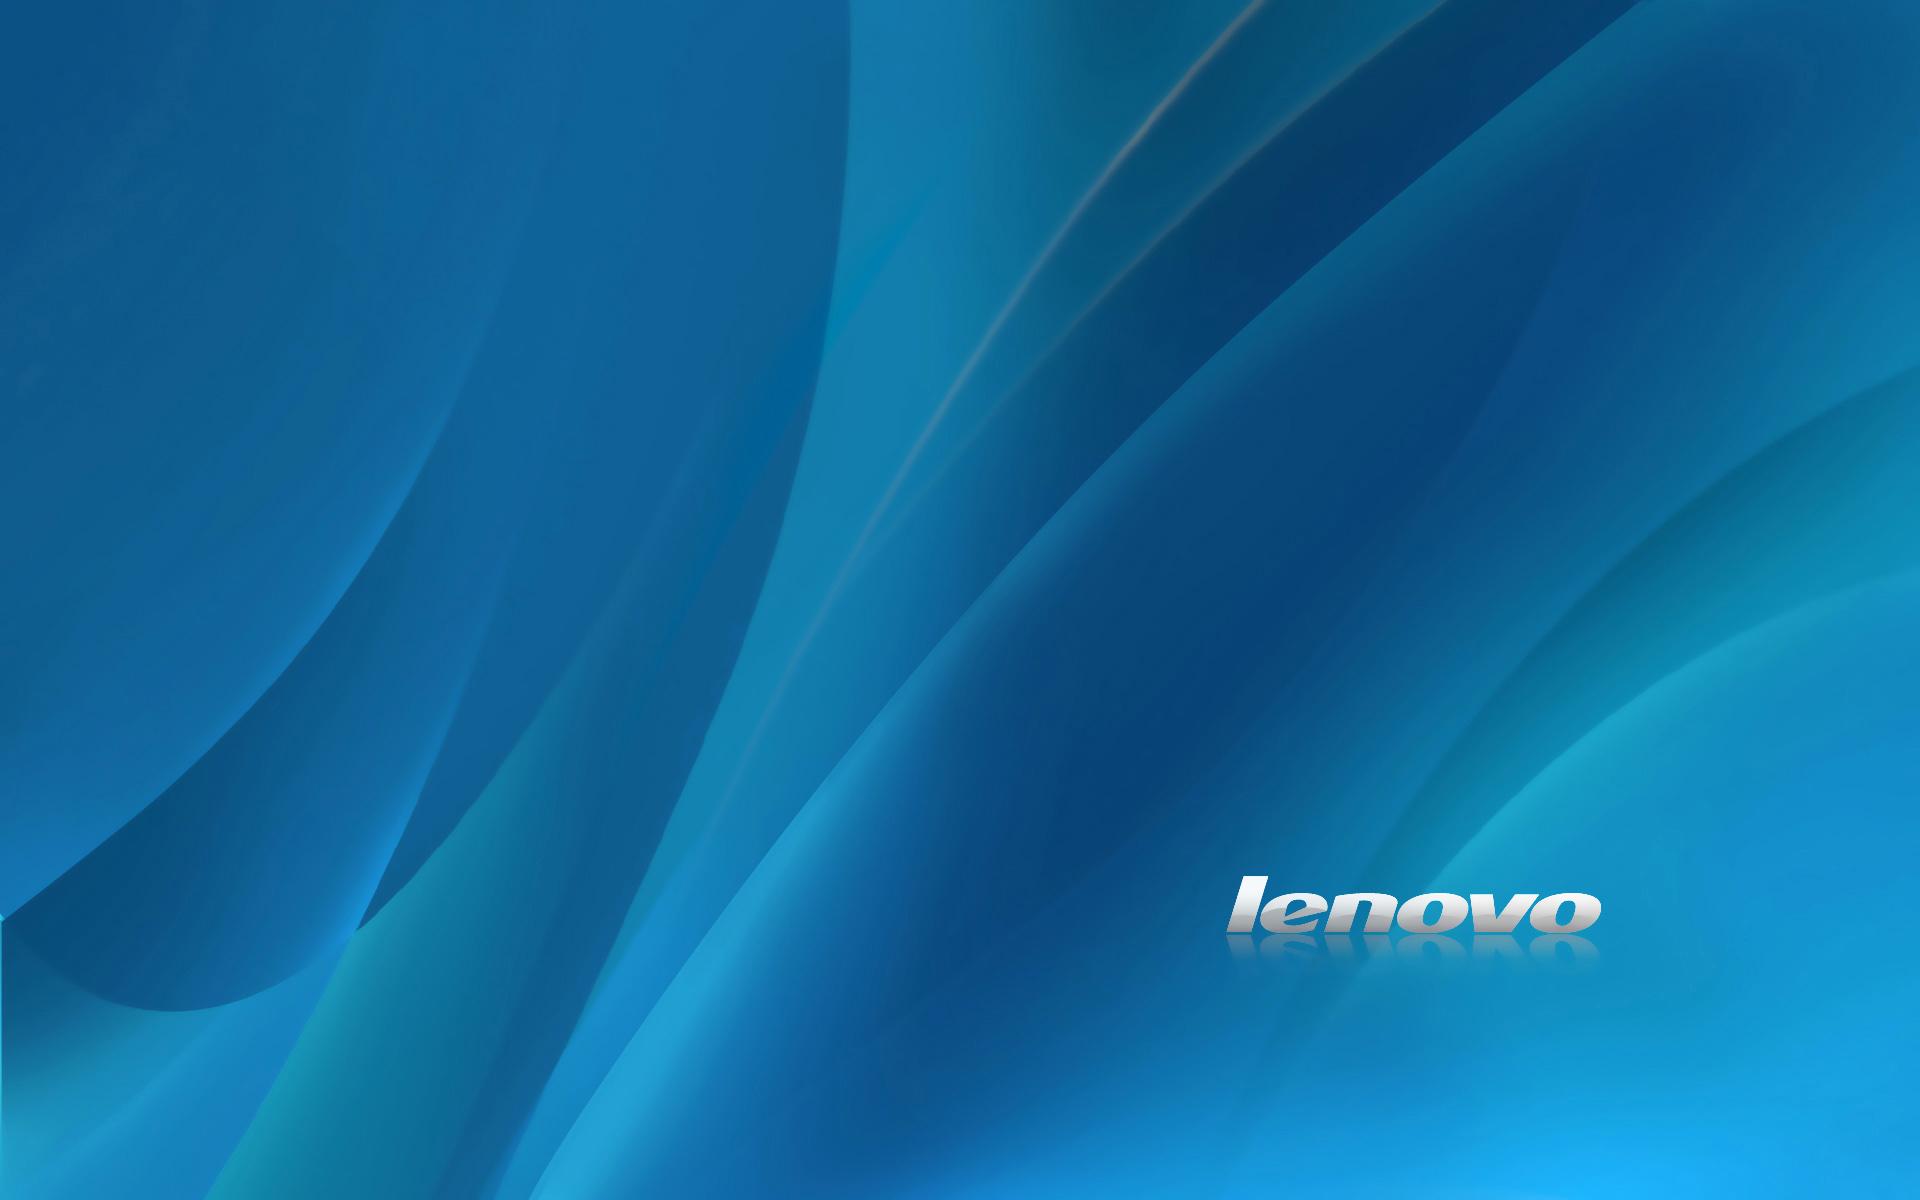 Lenovo Wallpaper Car: Lenovo Desktop Wallpaper